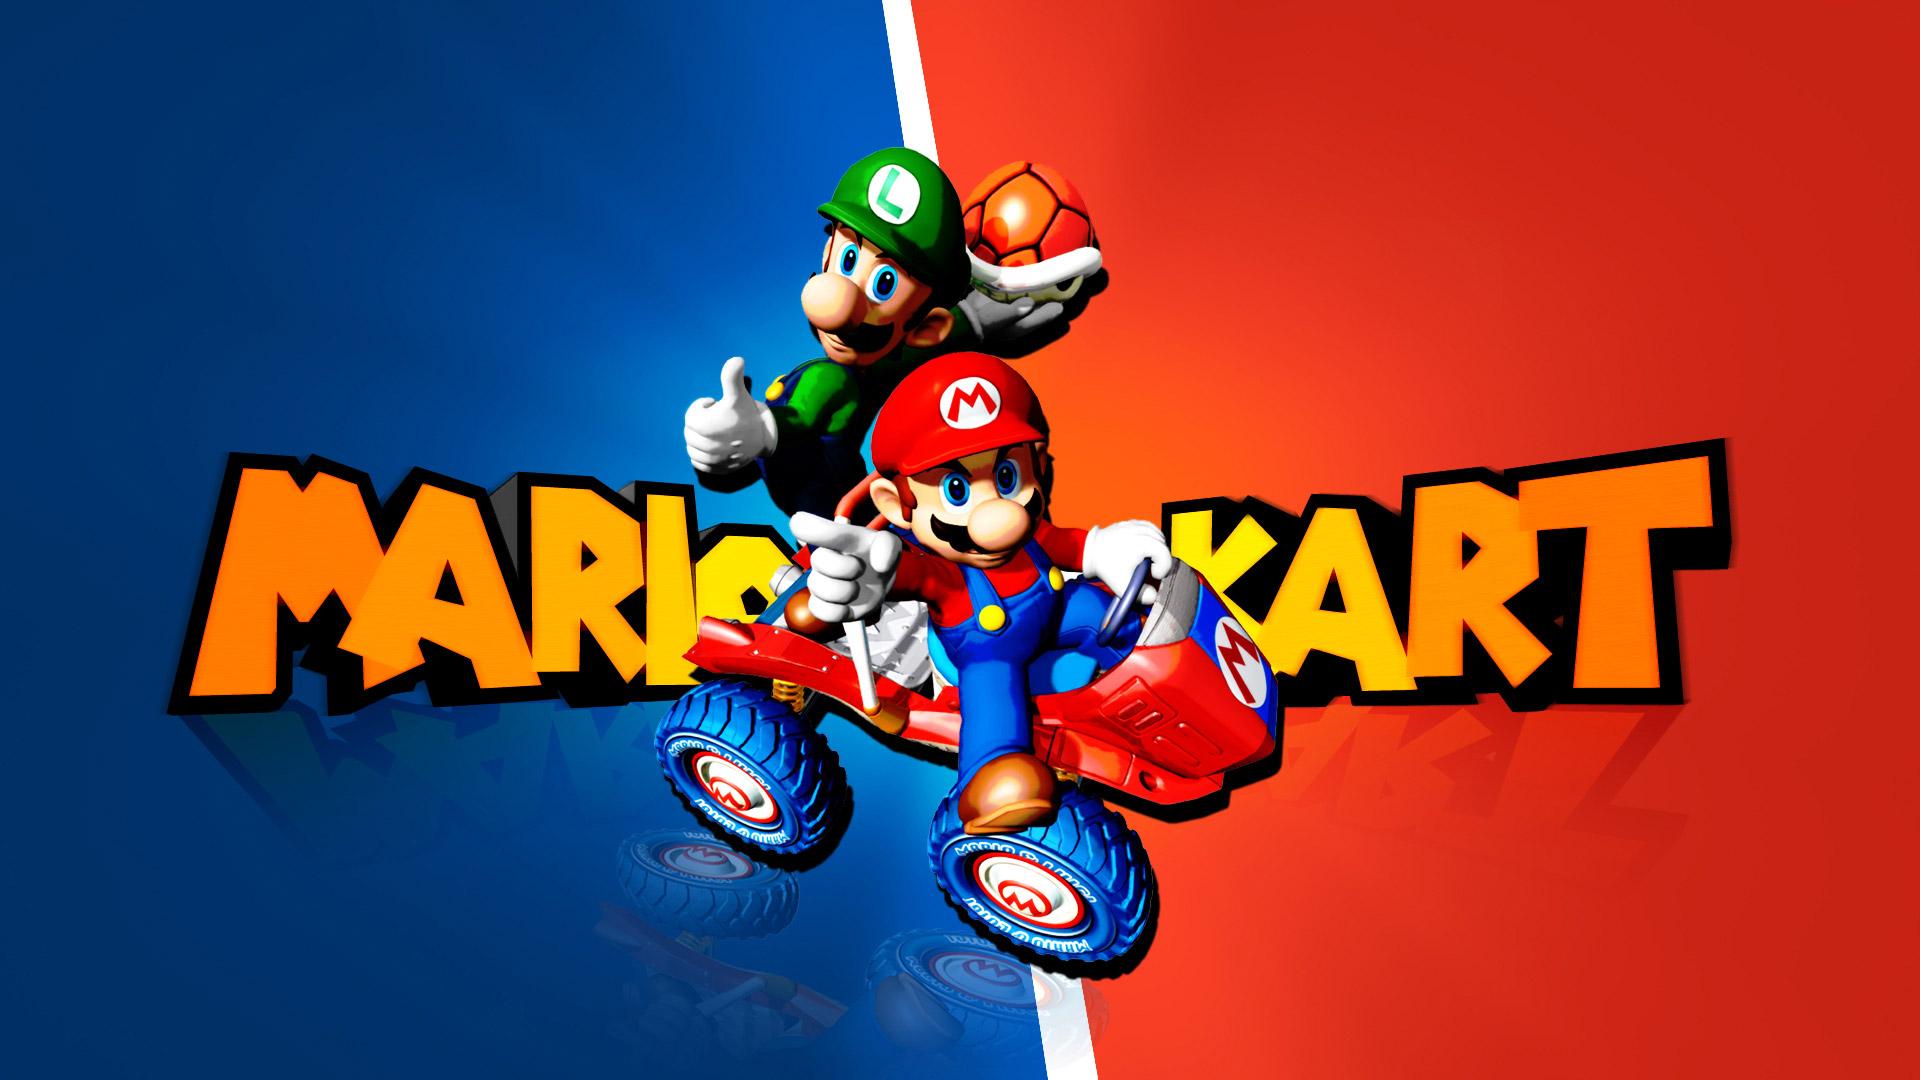 Free Mario Kart: Double Dash‼ Wallpaper in 1920x1080